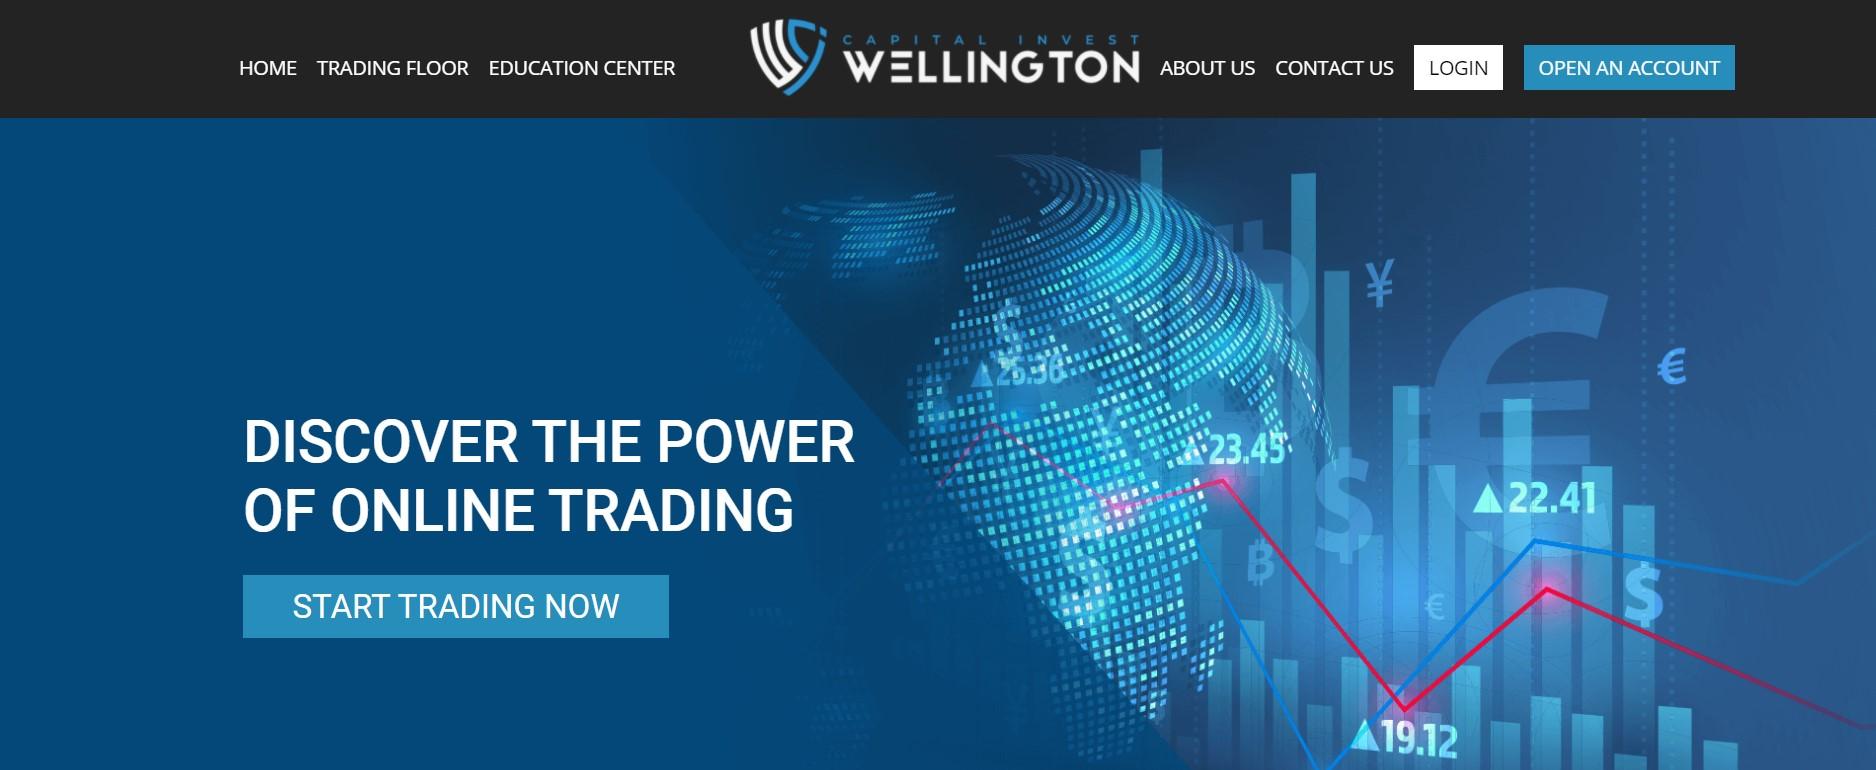 Wellingtoncapitalinvest website